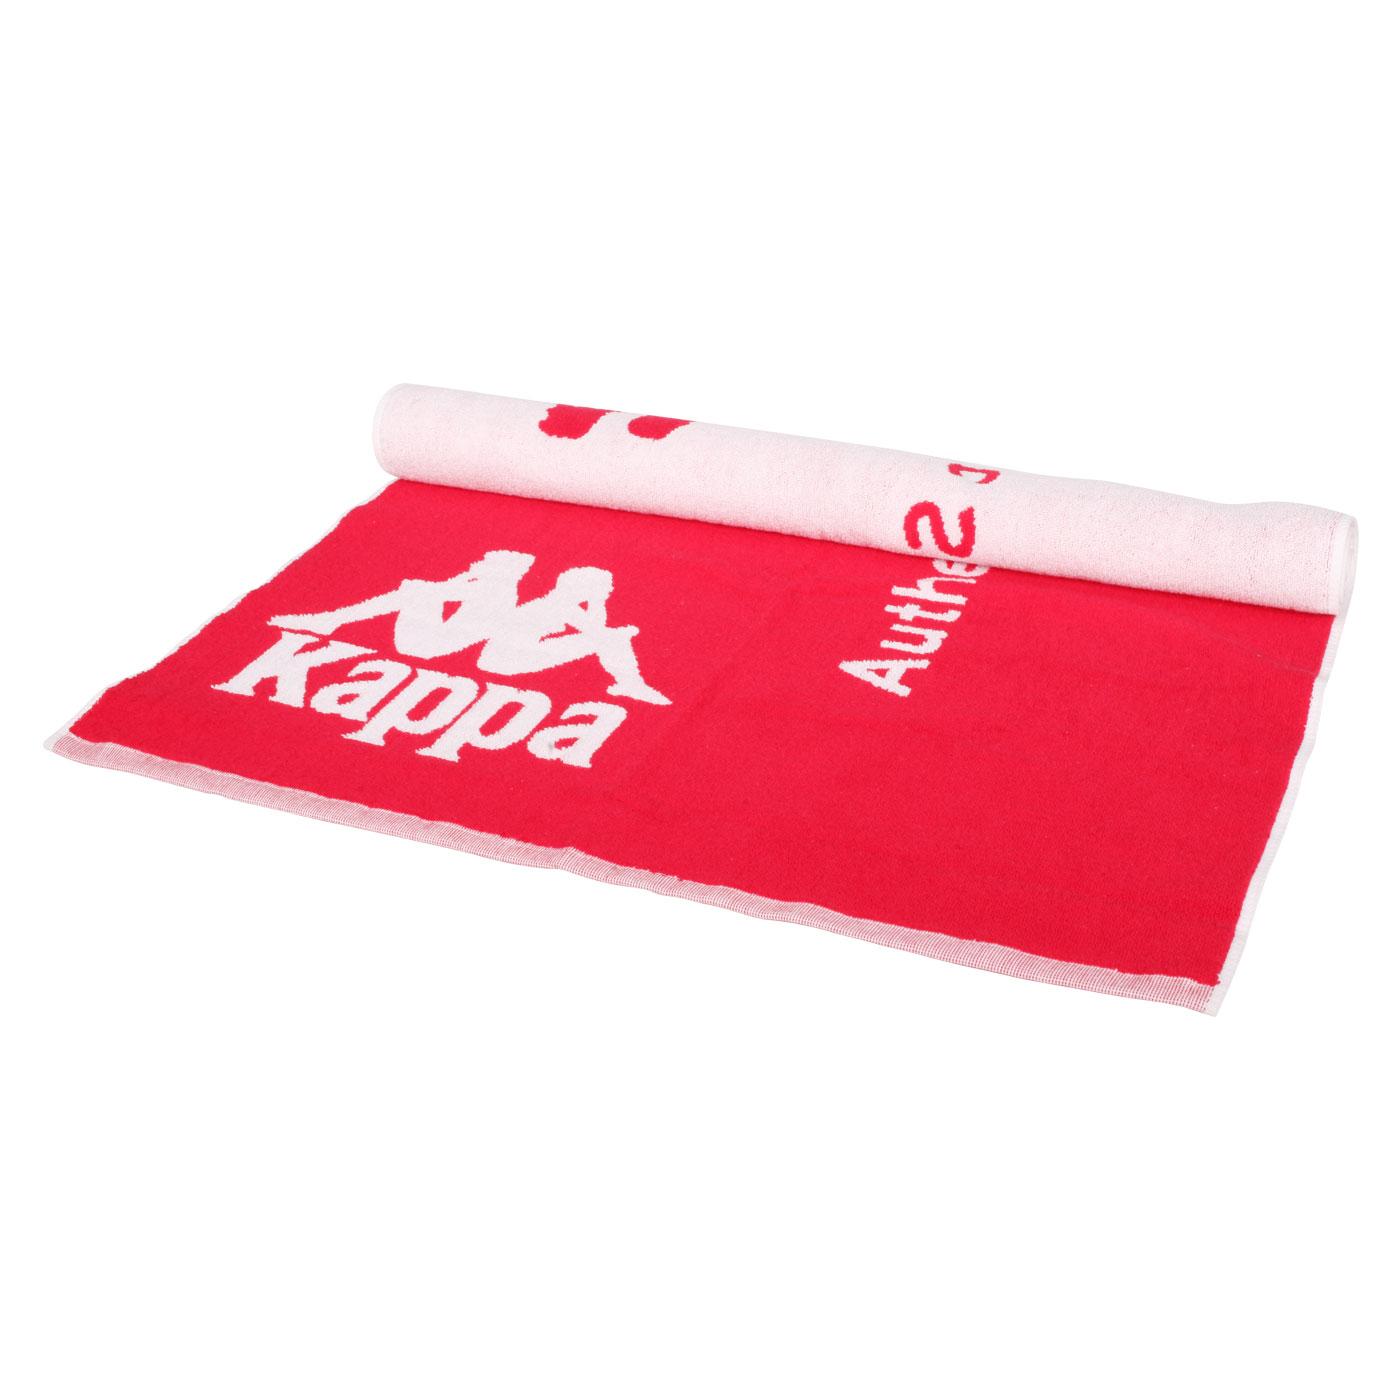 KAPPA 運動毛巾 32157QW-D18